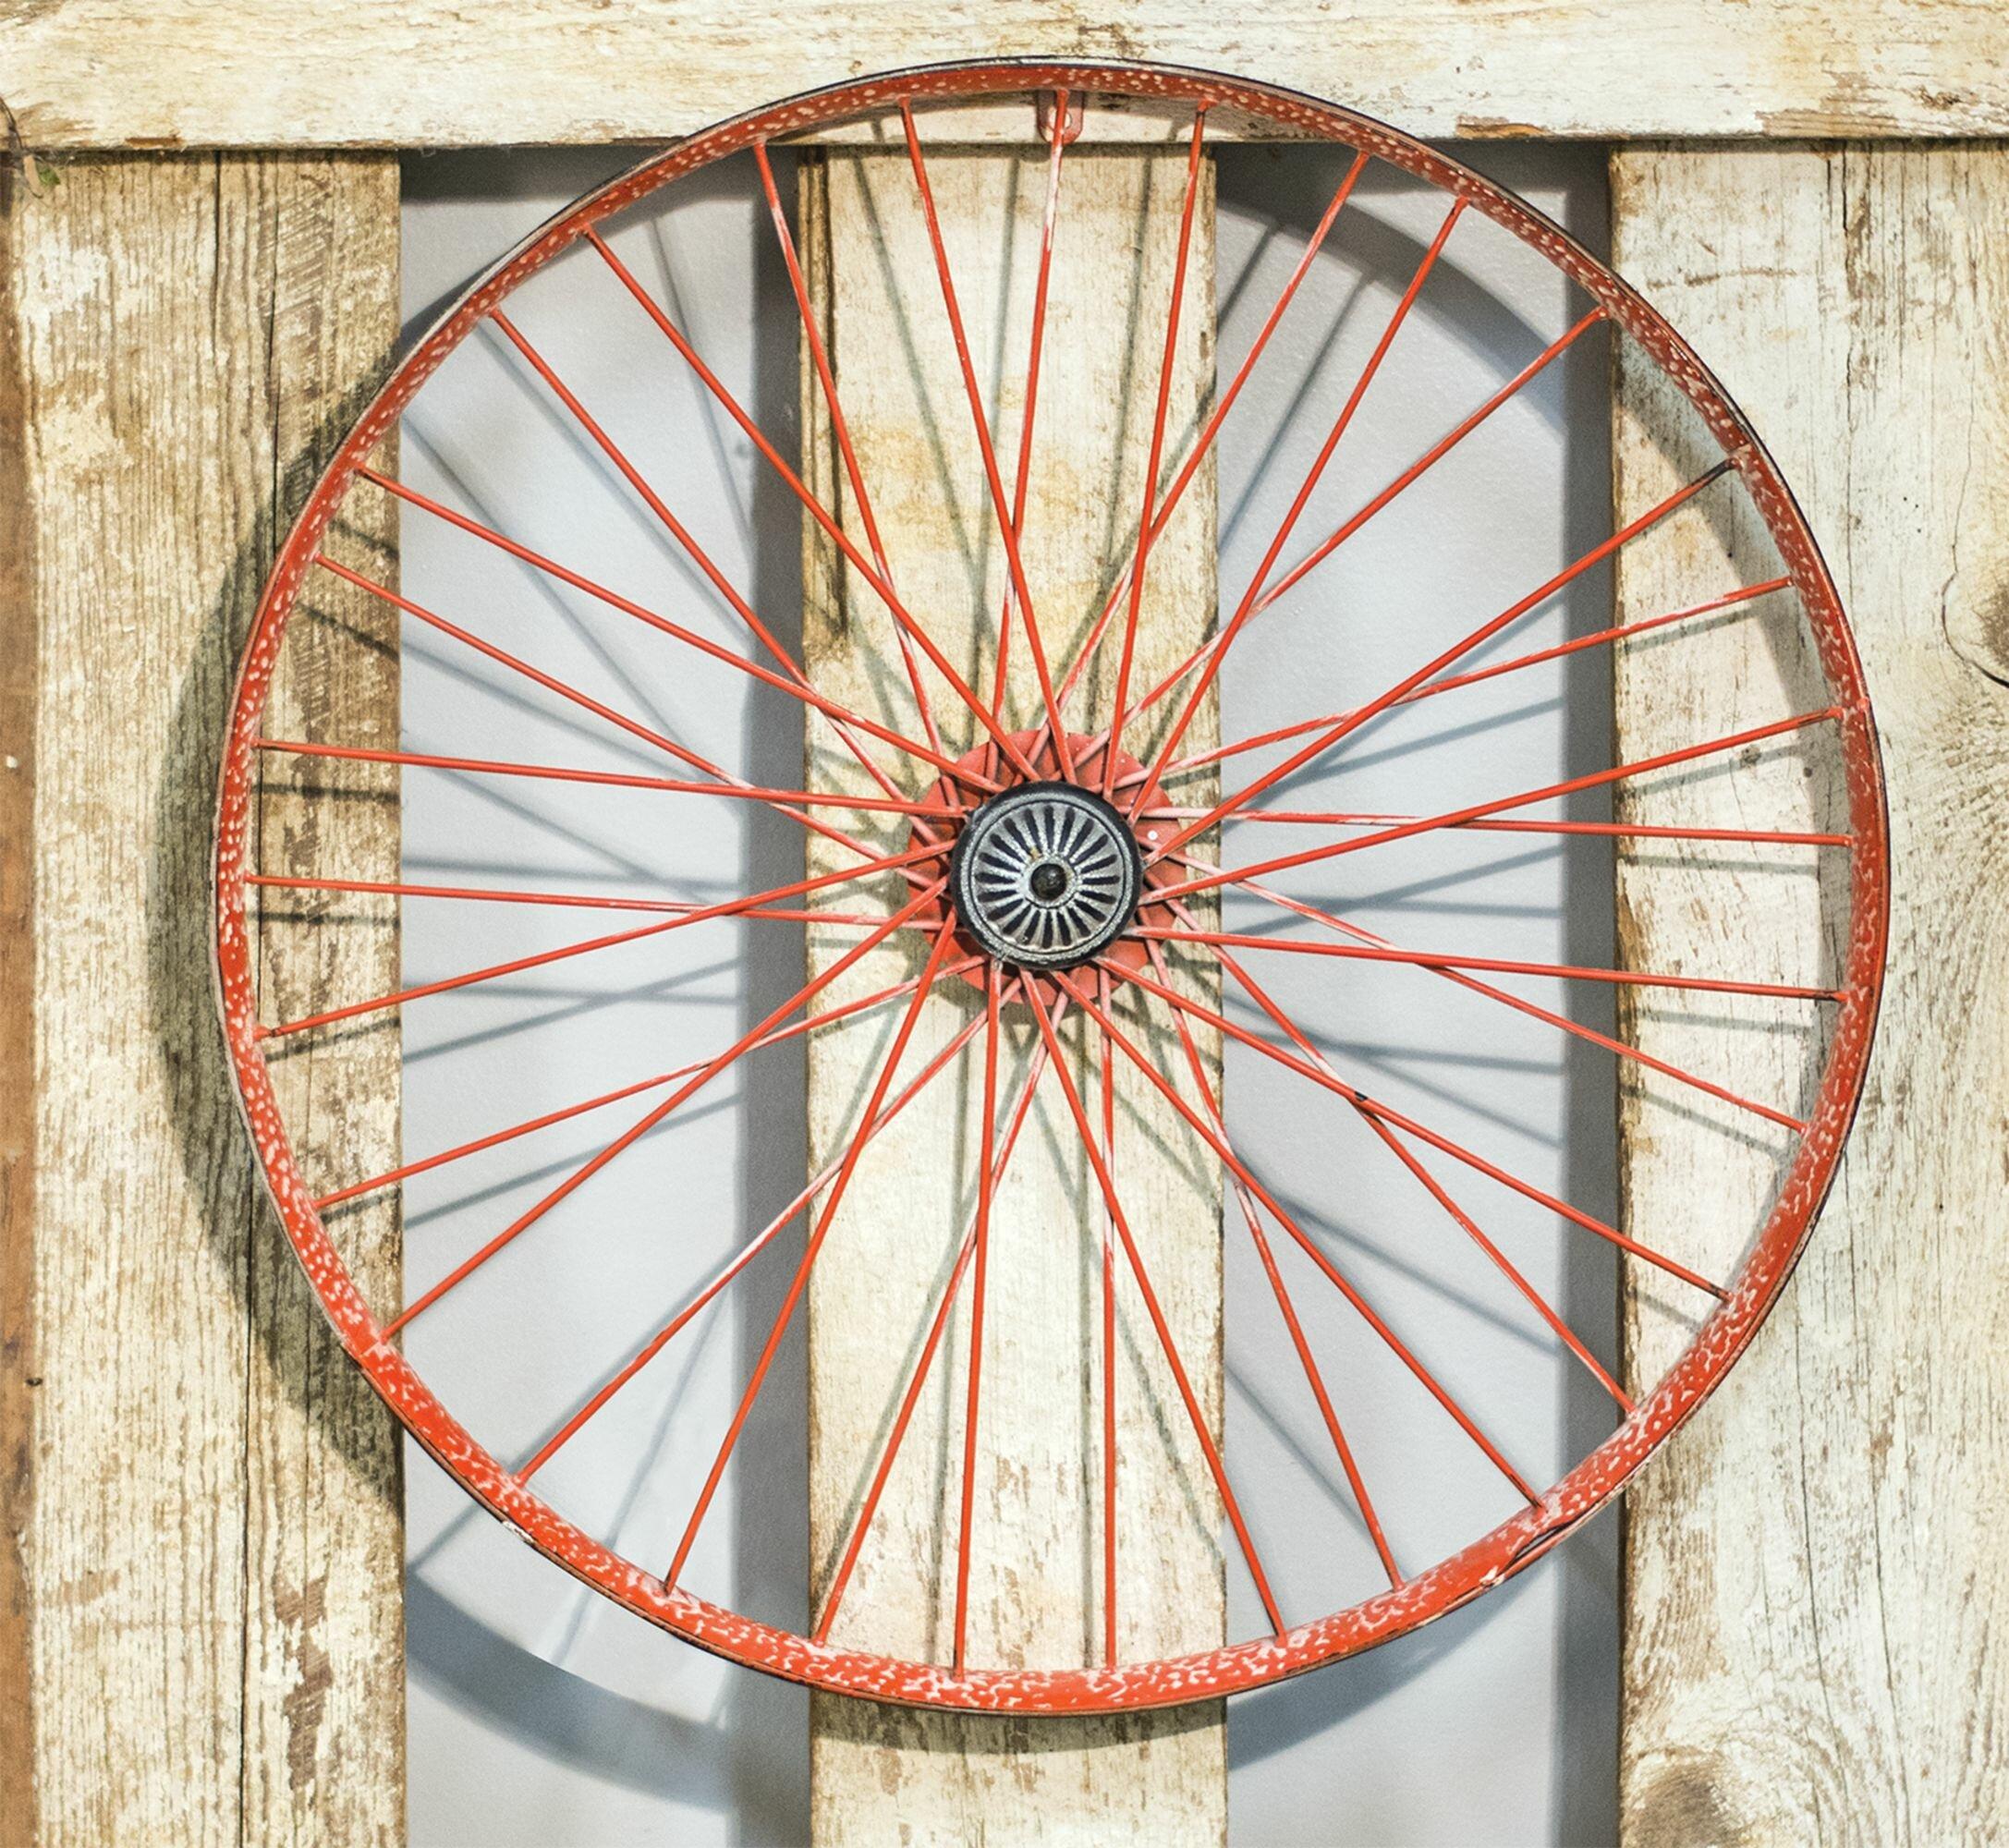 Williston Forge Metal Wagon Wheel Wall Decor Reviews Wayfair